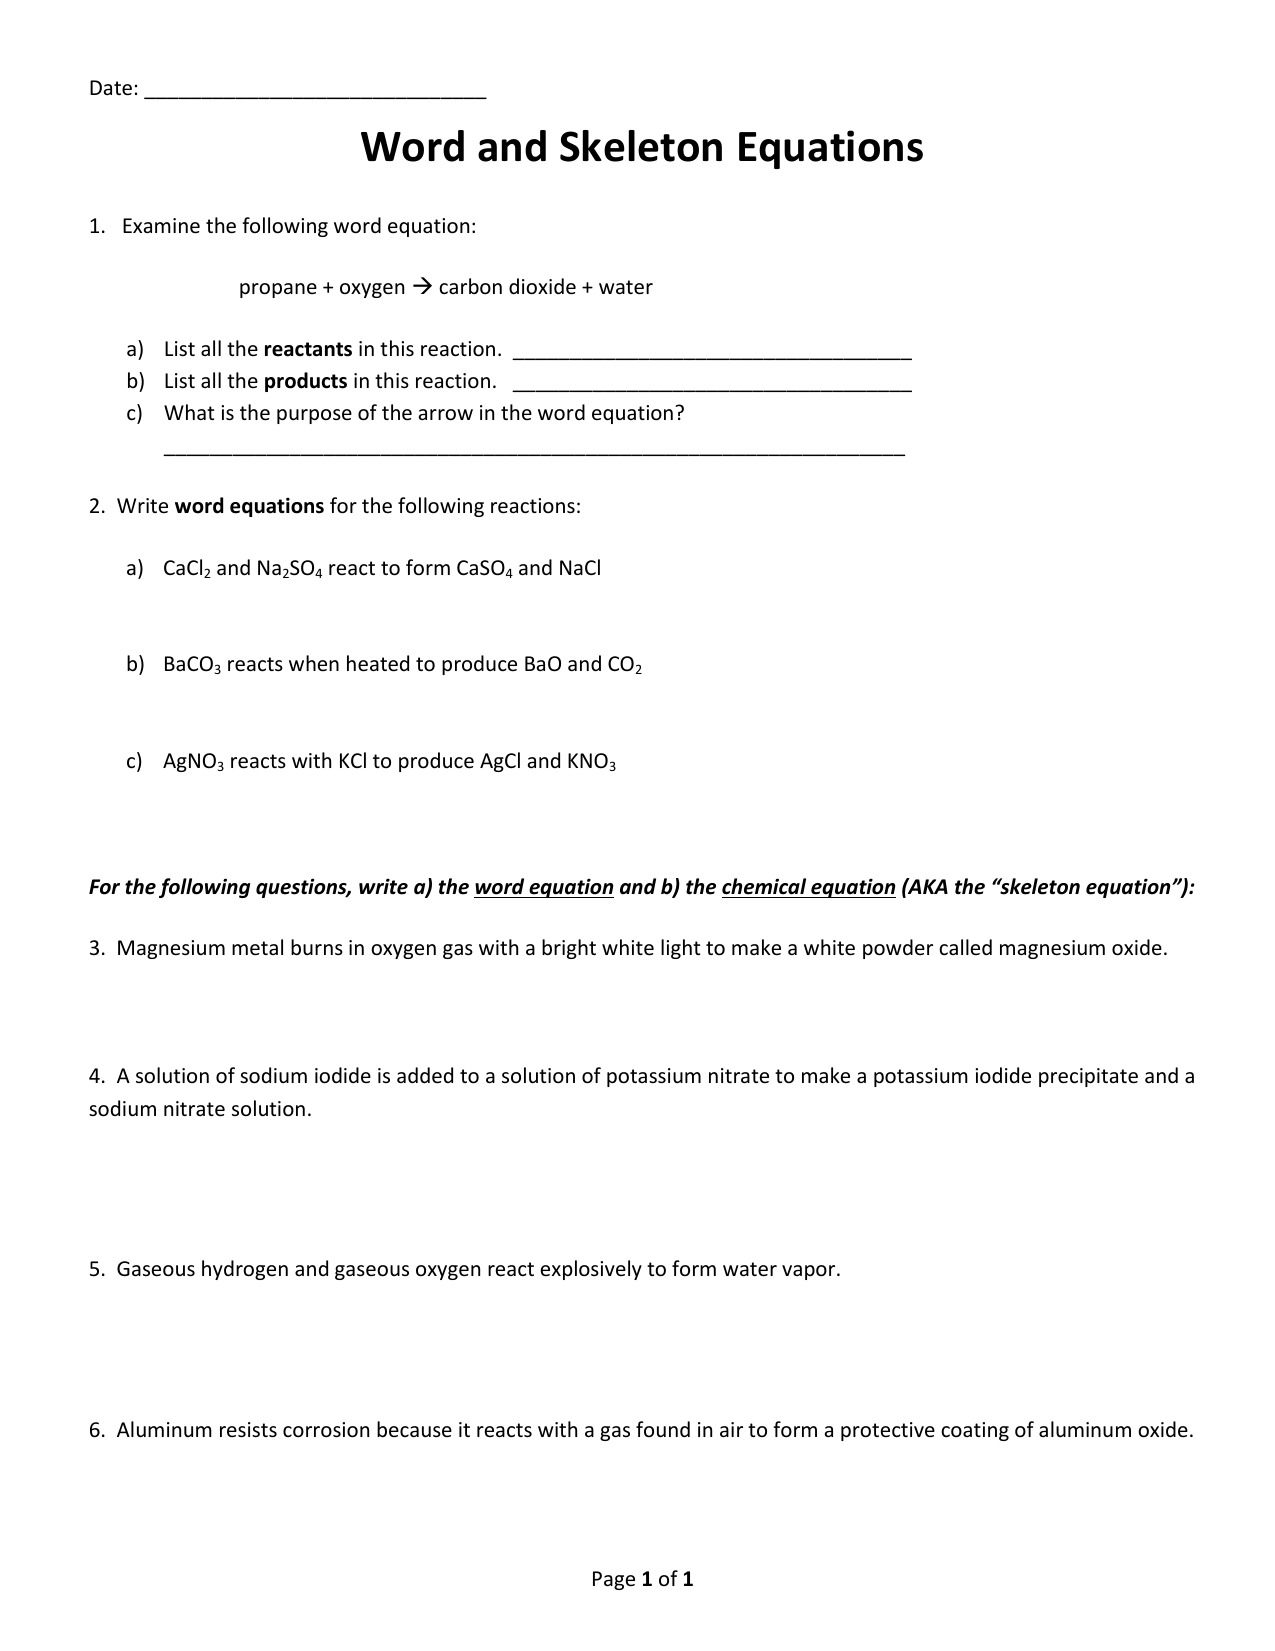 Writing Skeleton Equations From Word Worksheet